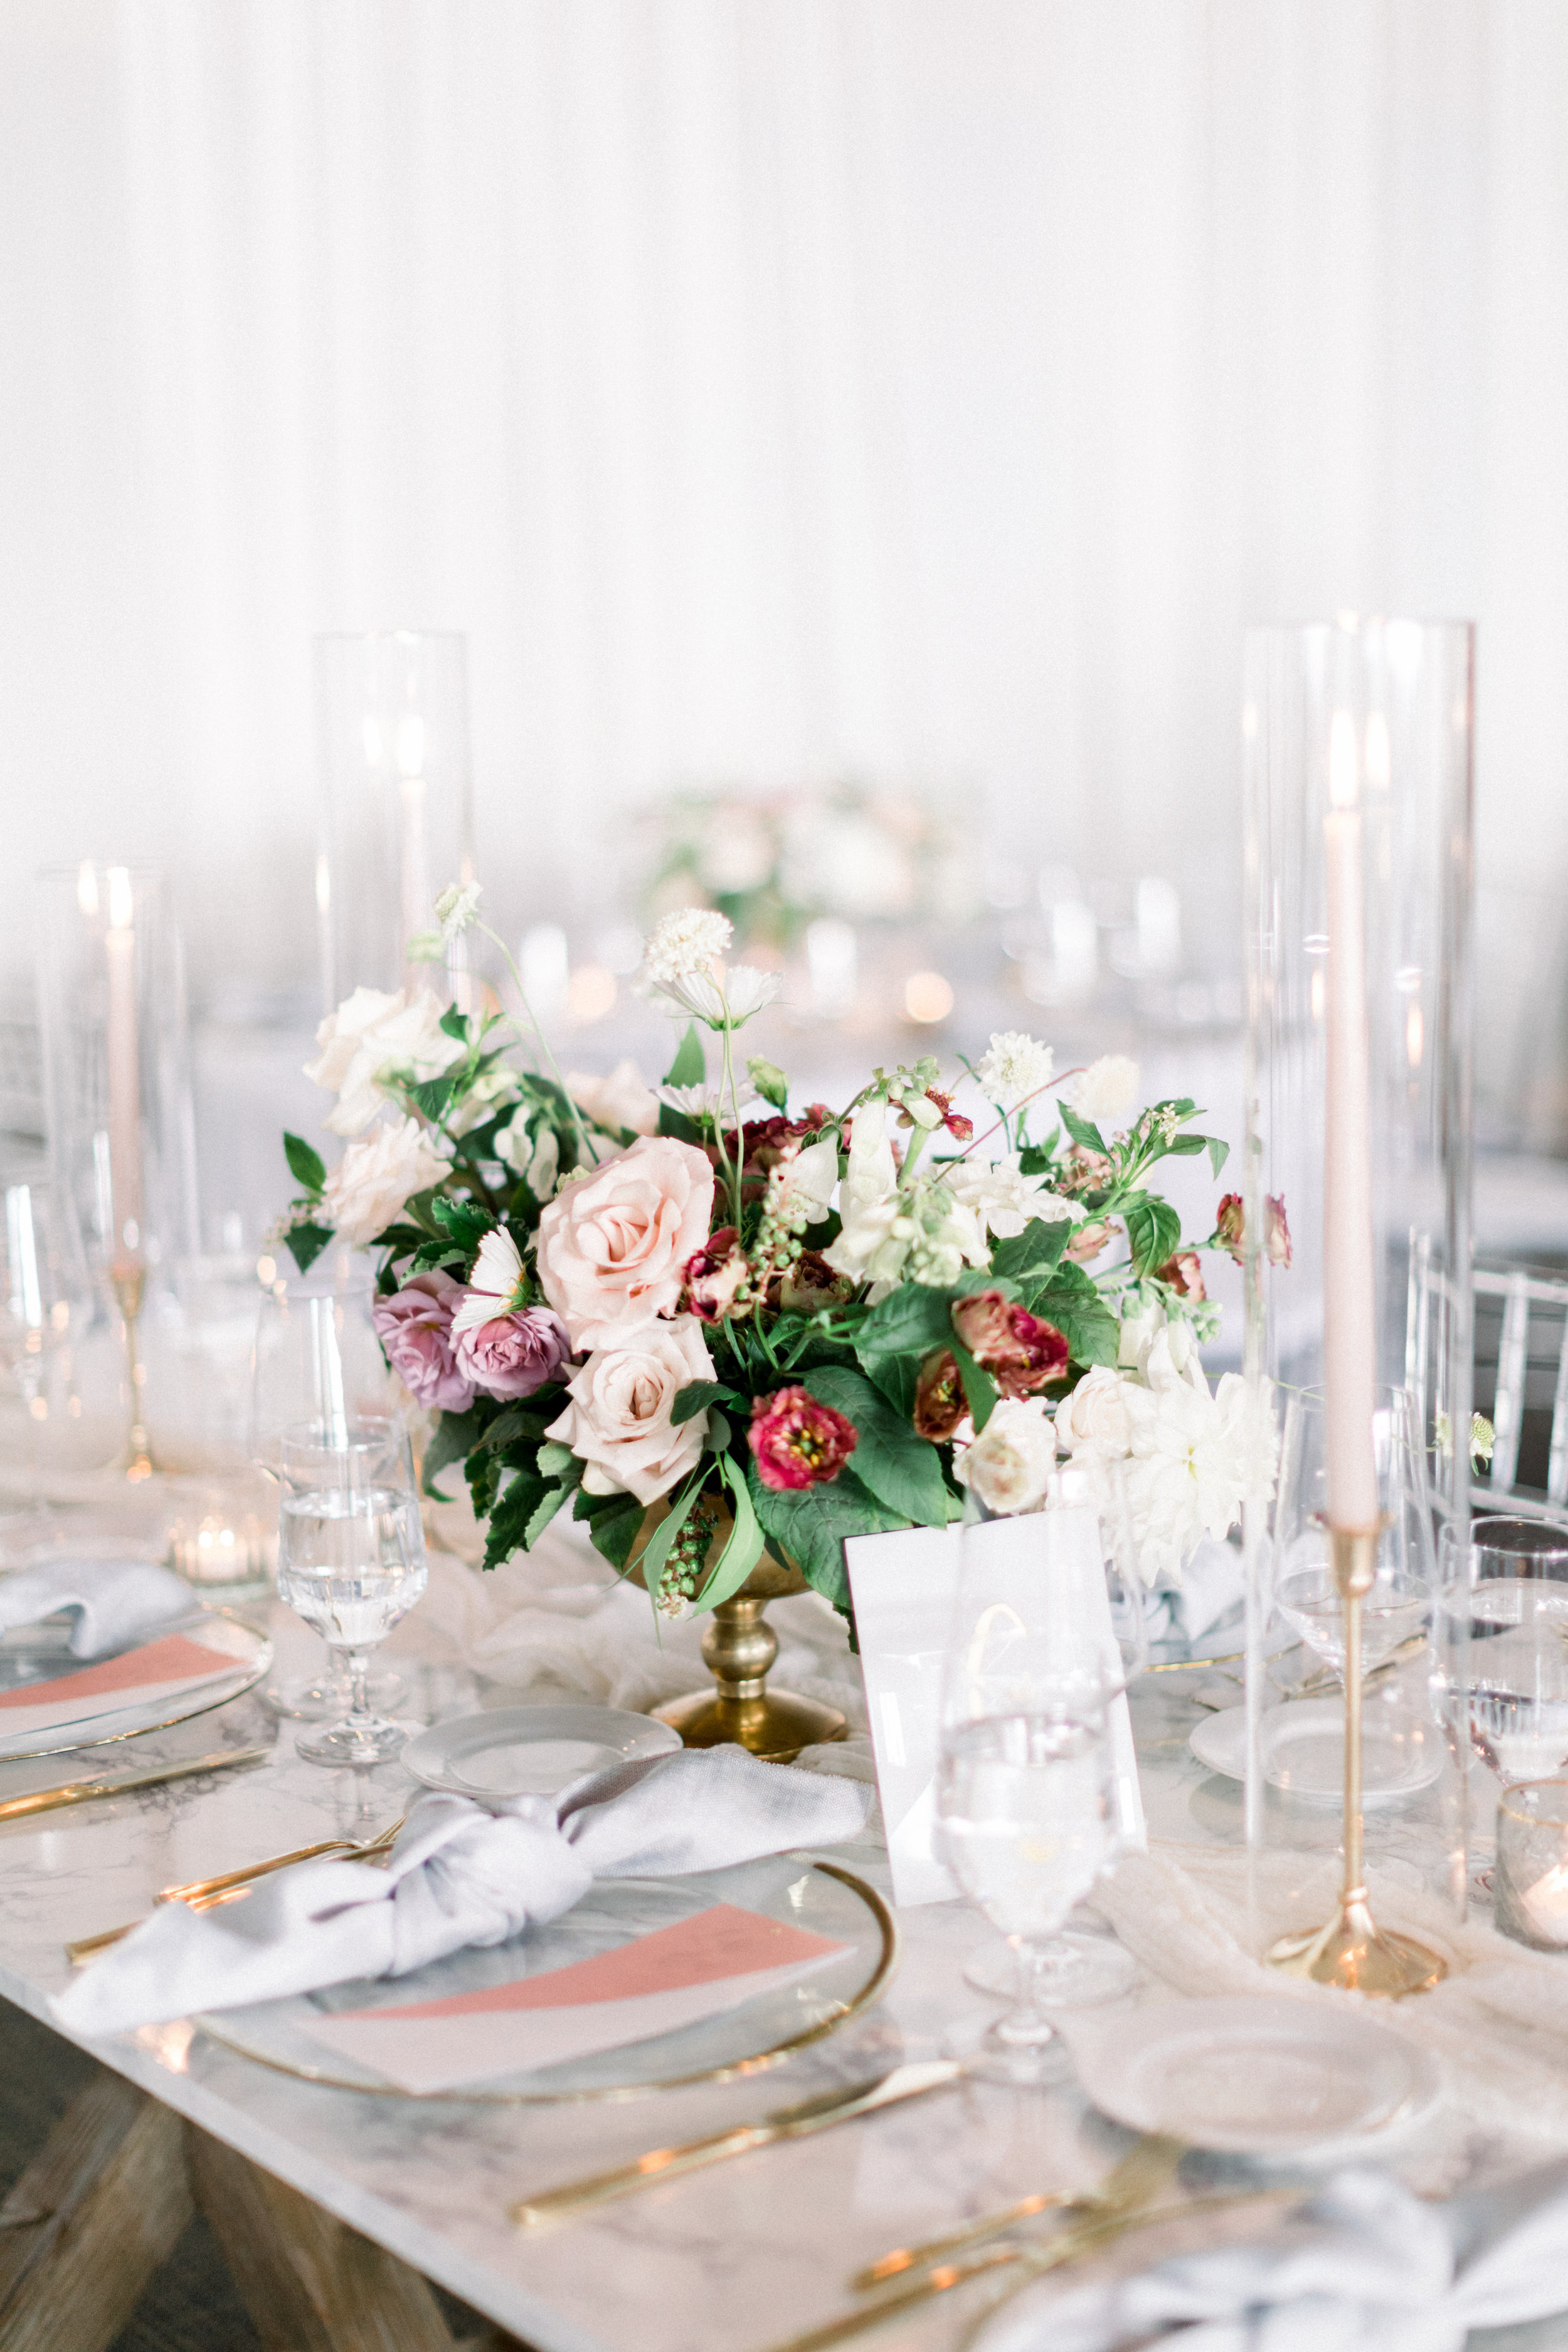 marble tabletop wedding decor